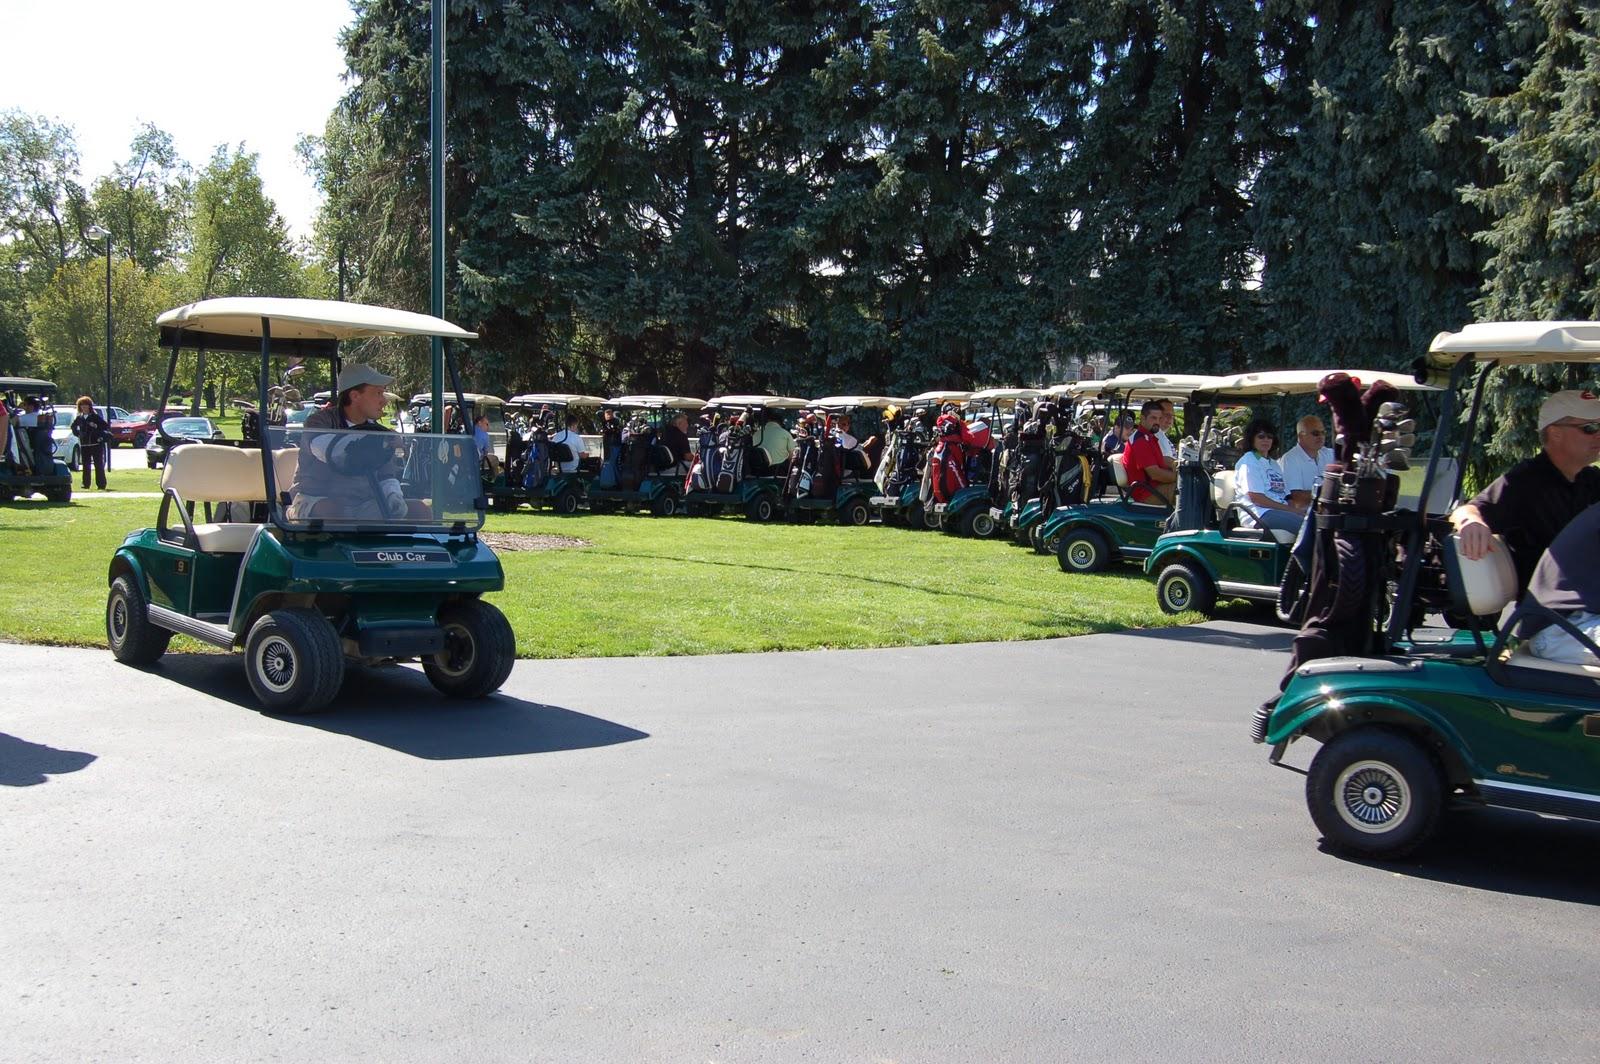 Bill fleck memorial golf outing september 2011 for Mcelwain motors ellwood city